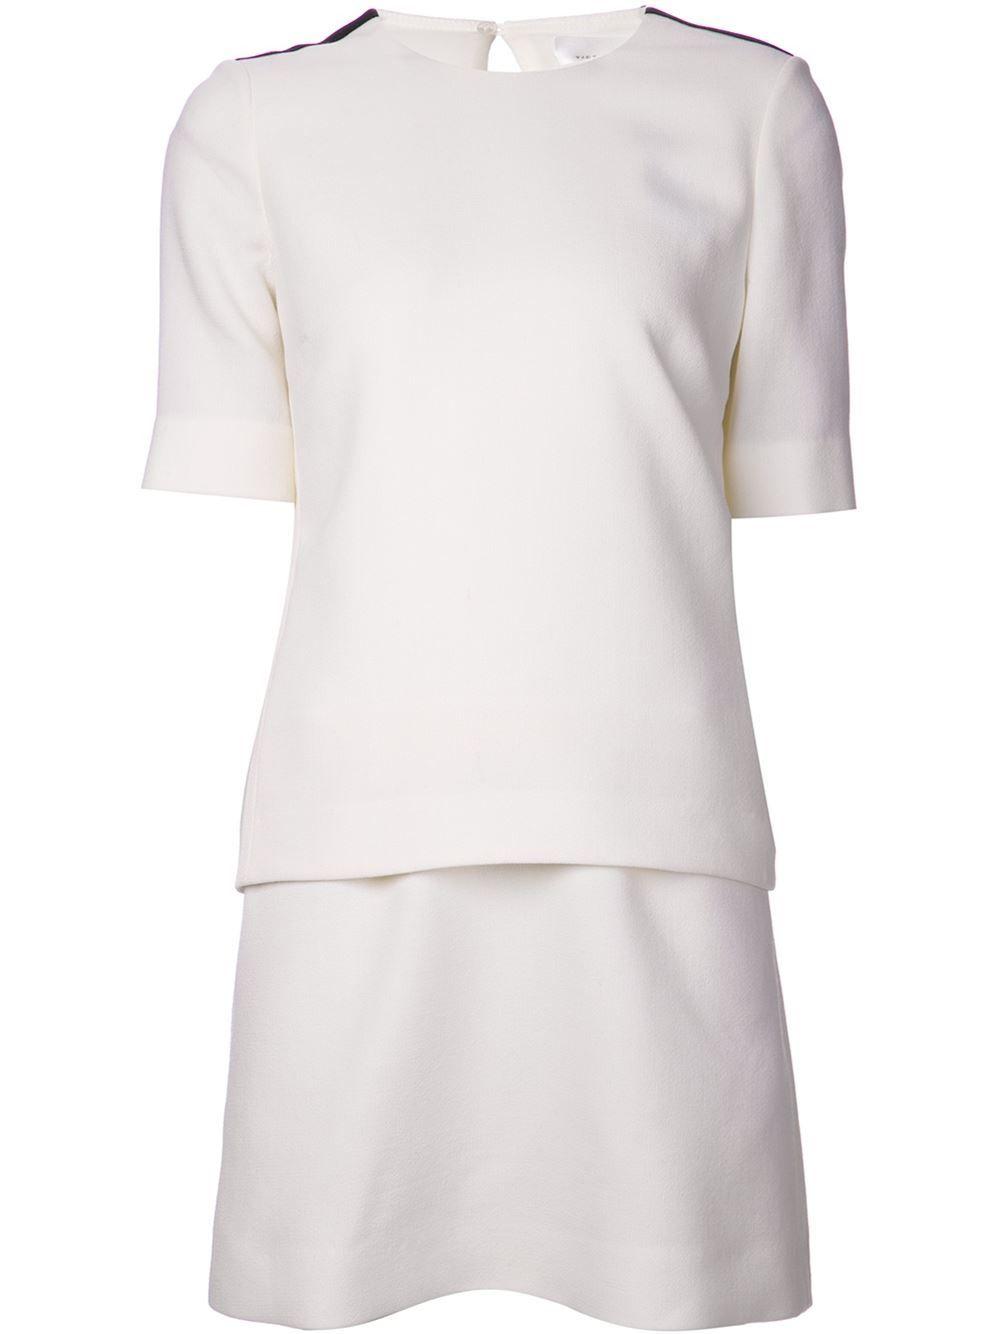 Victoria Victoria Beckham Tux Stripe Dress - Forty Five Ten - Farfetch.com